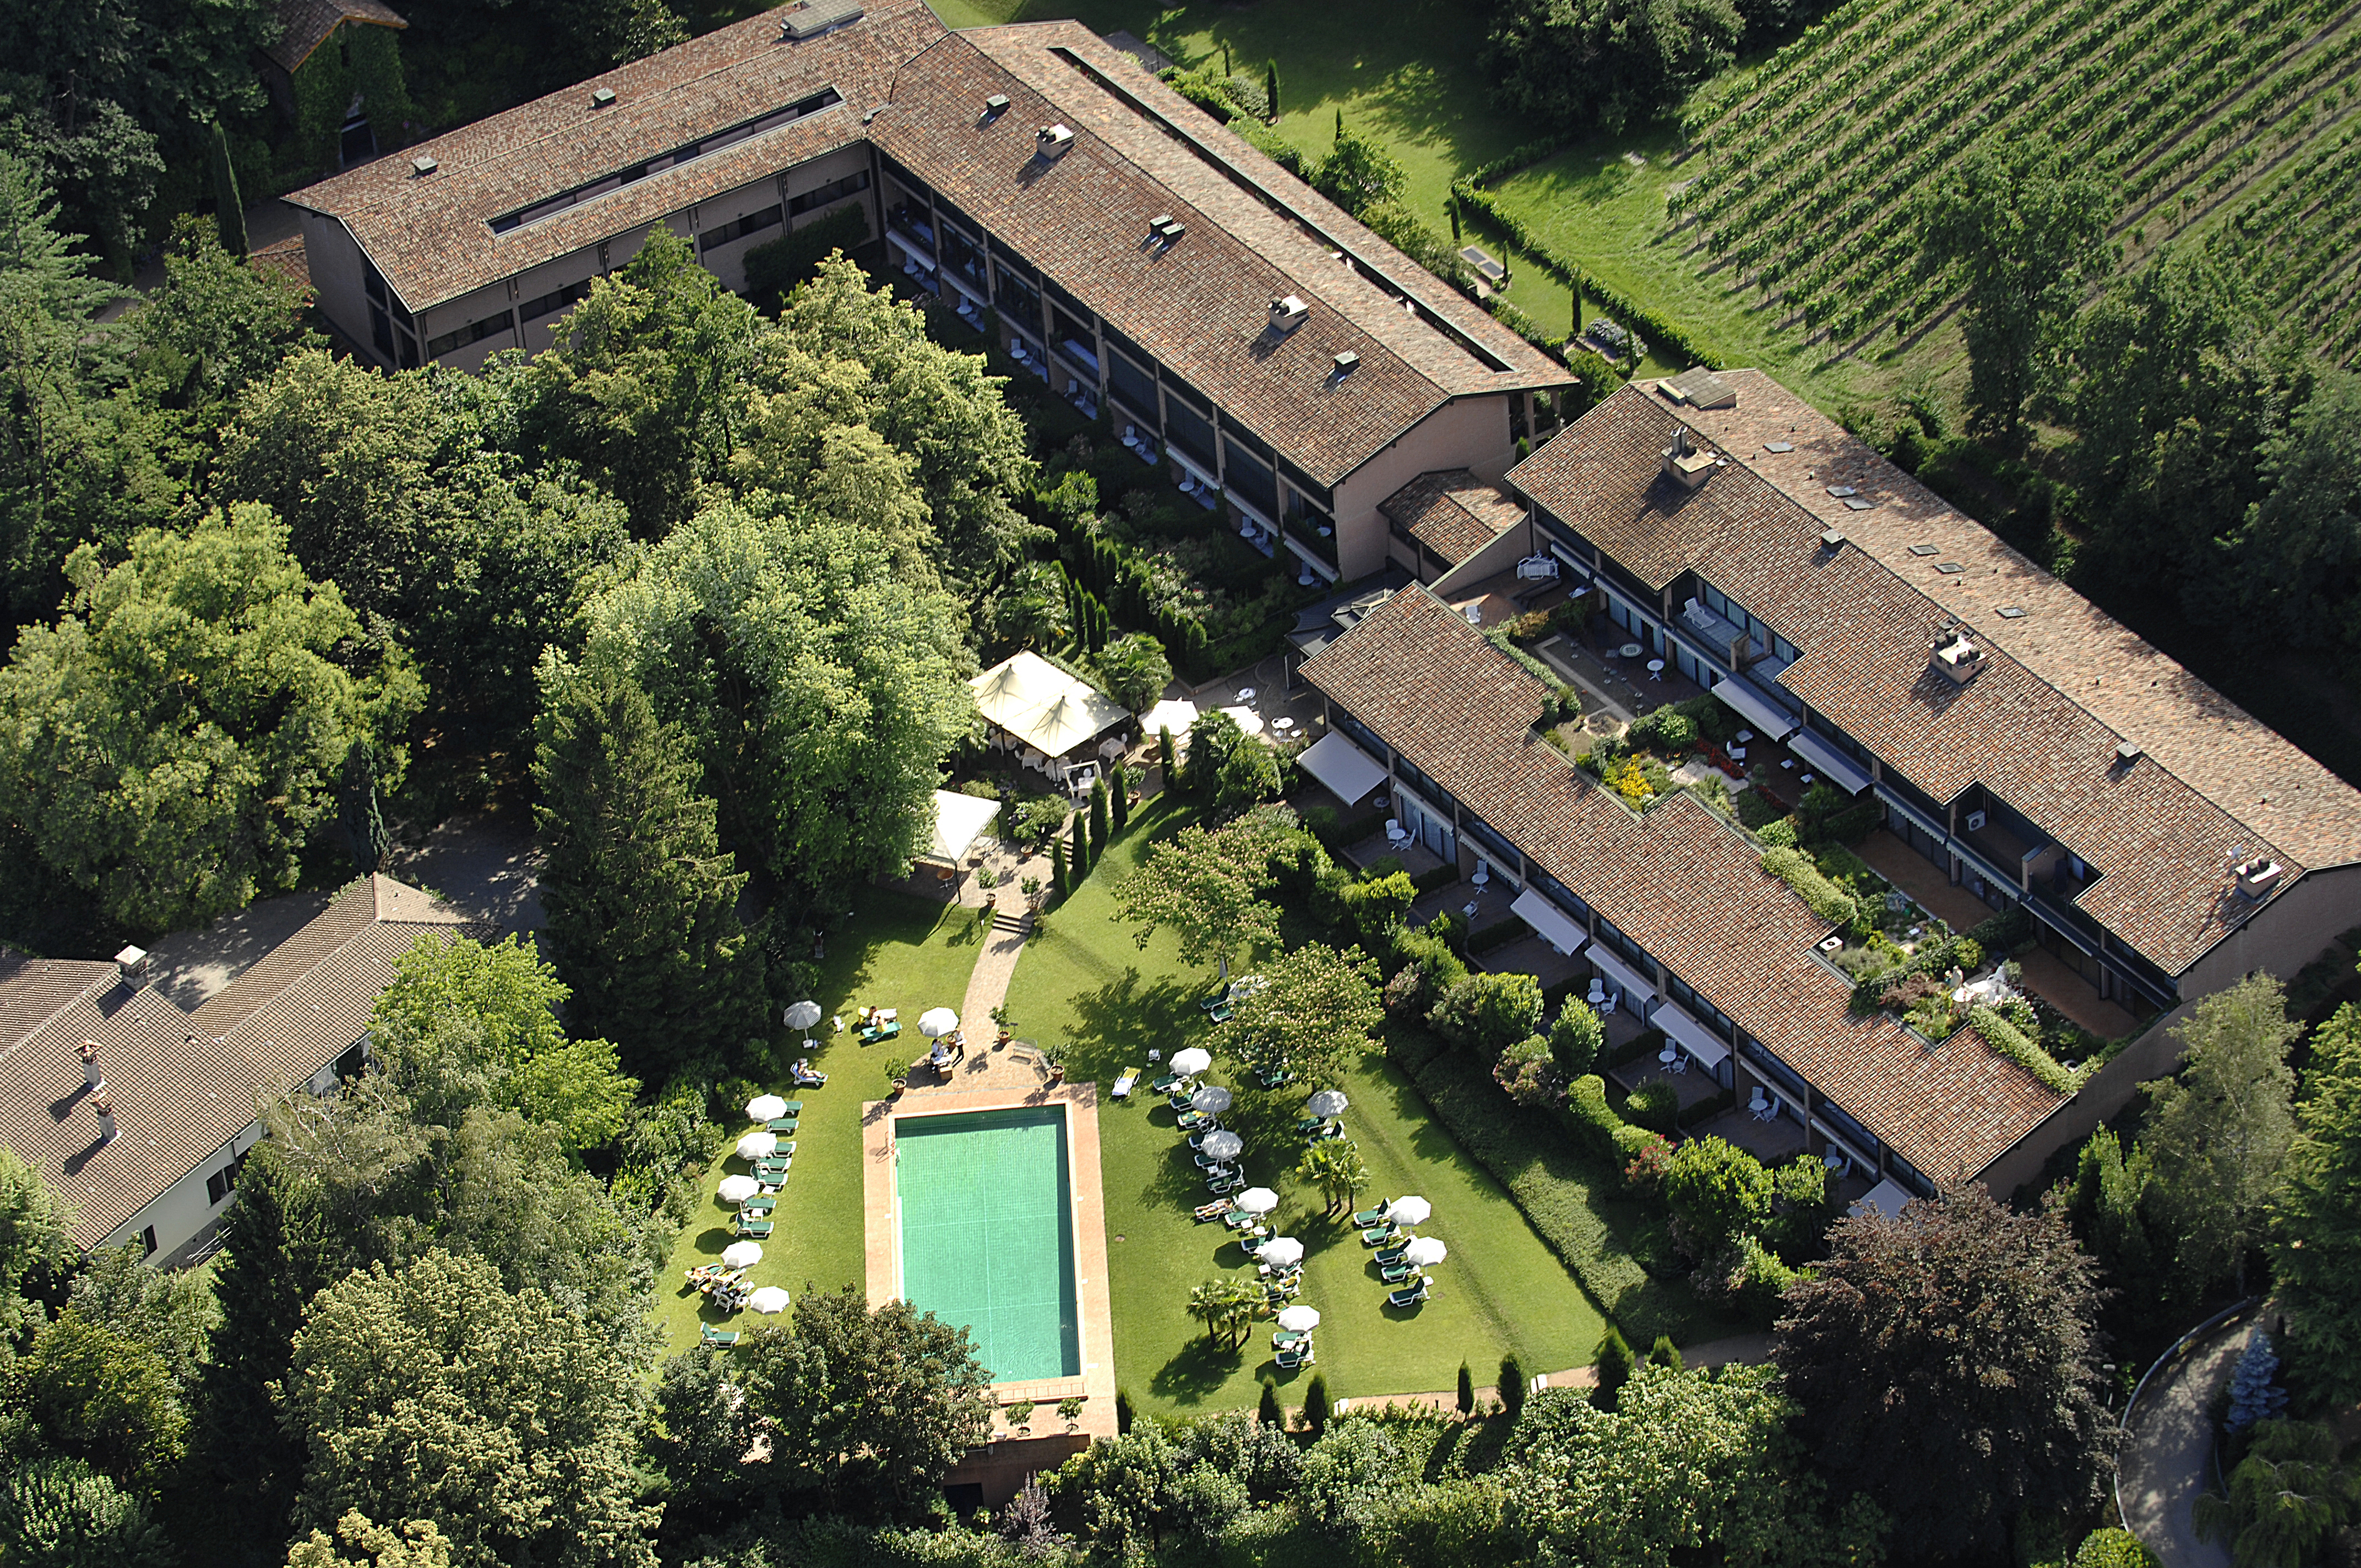 Park Hotel Principe, Lugano